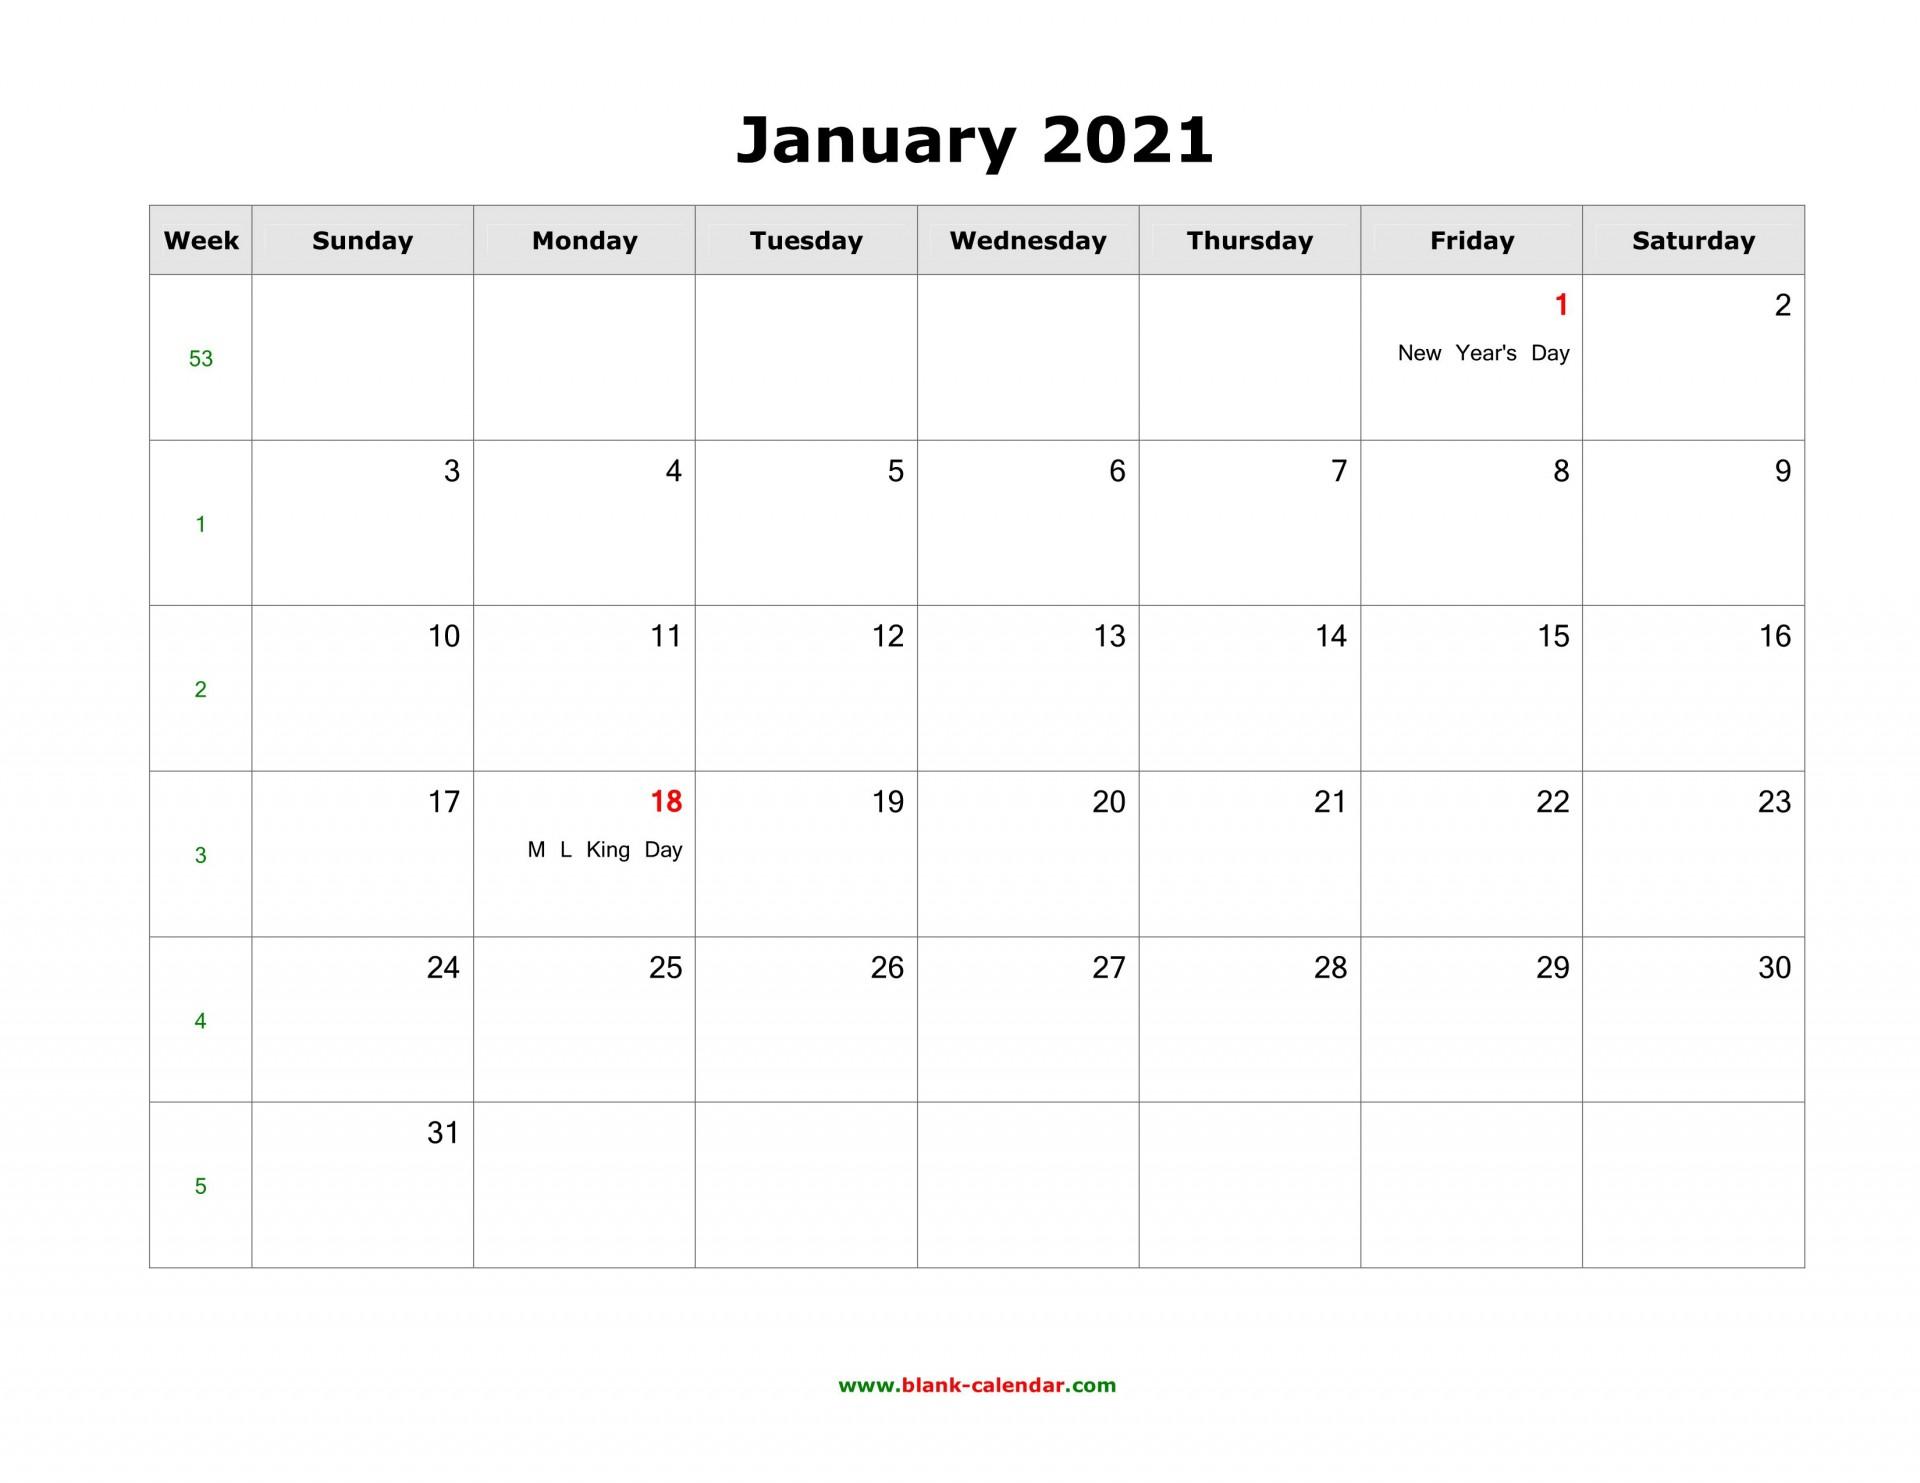 002 Best Google Doc Weekly Calendar Template 2021 High Resolution  Free1920